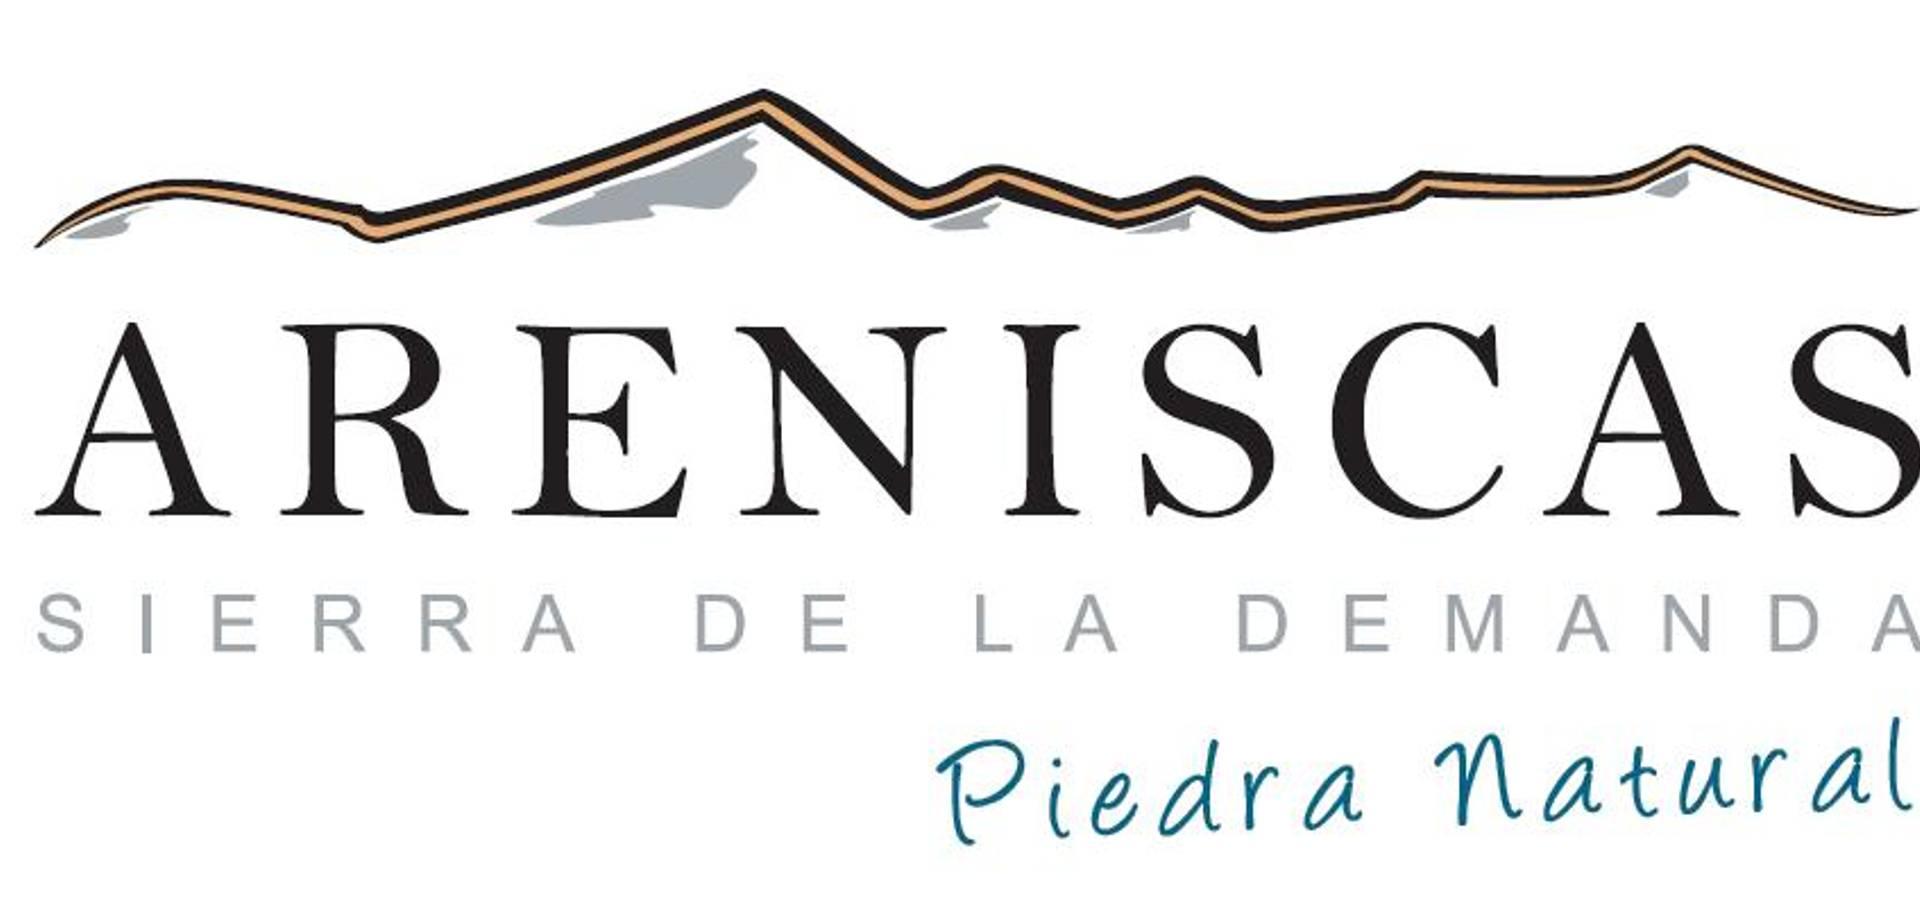 Areniscas Sierra de la Demanda   – ◉ – SIERRA  Buff  Sandstone  quarries in  Spain